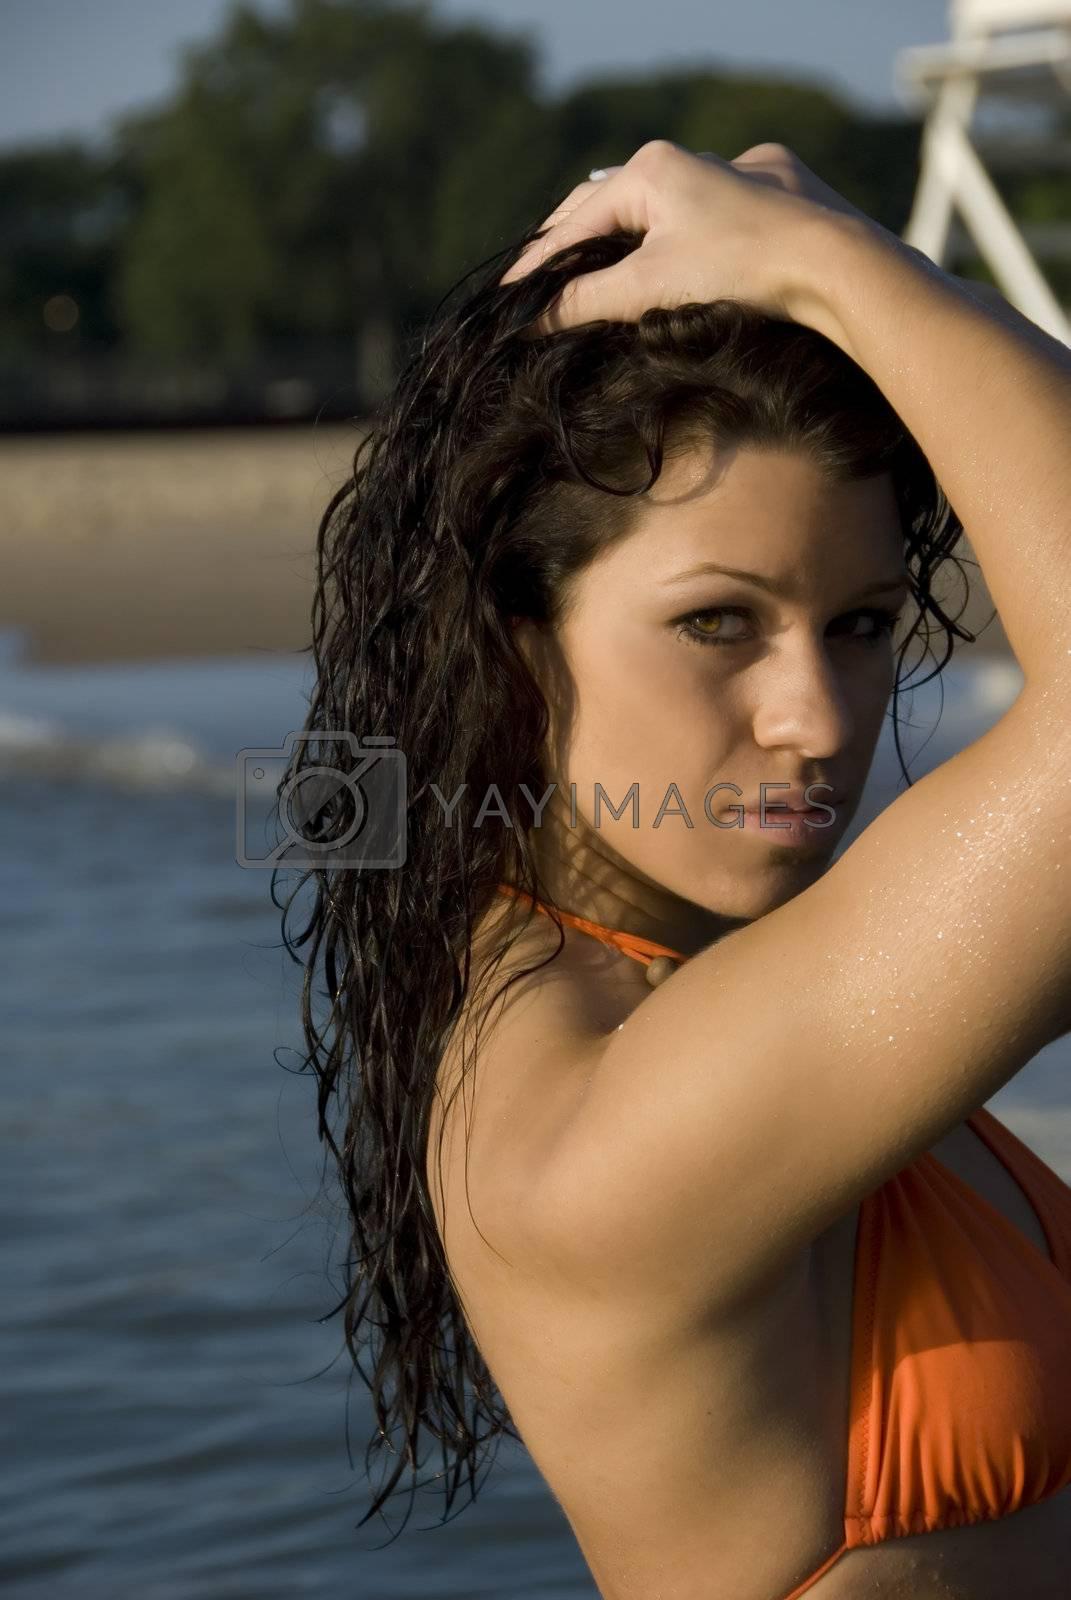 Nikki at the Evanston beach.